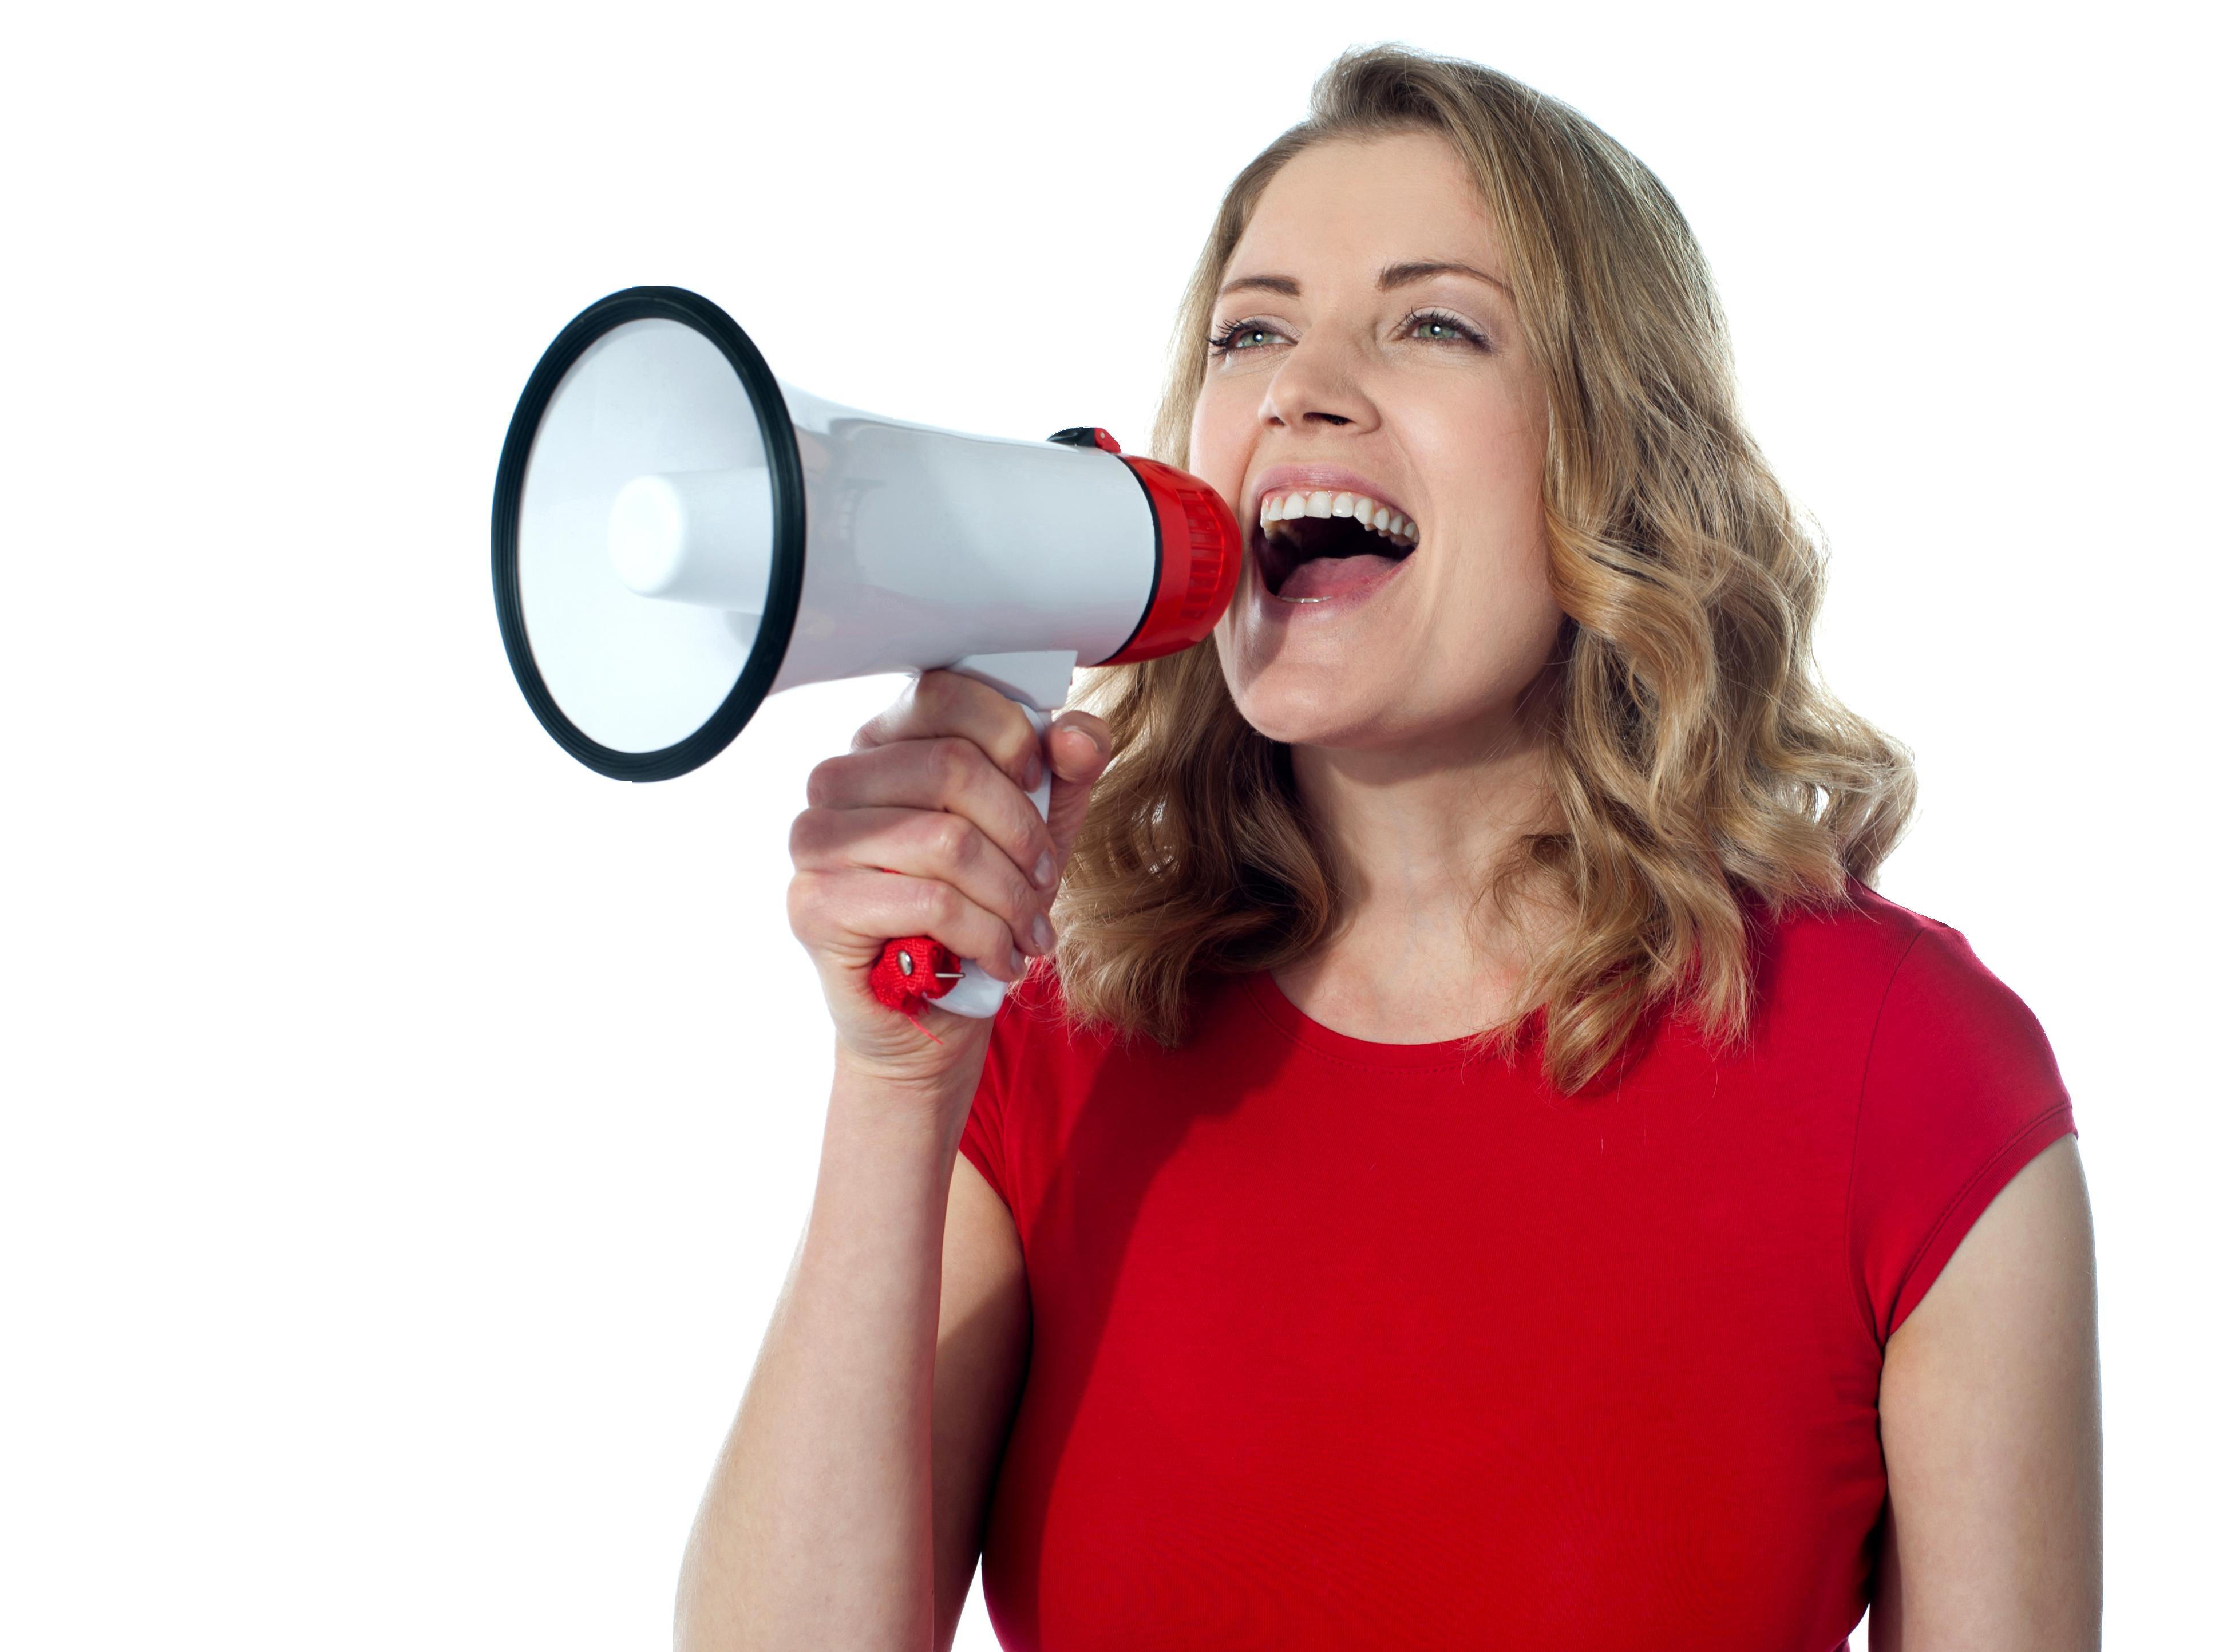 Women Holding Loudspeaker PNG Image